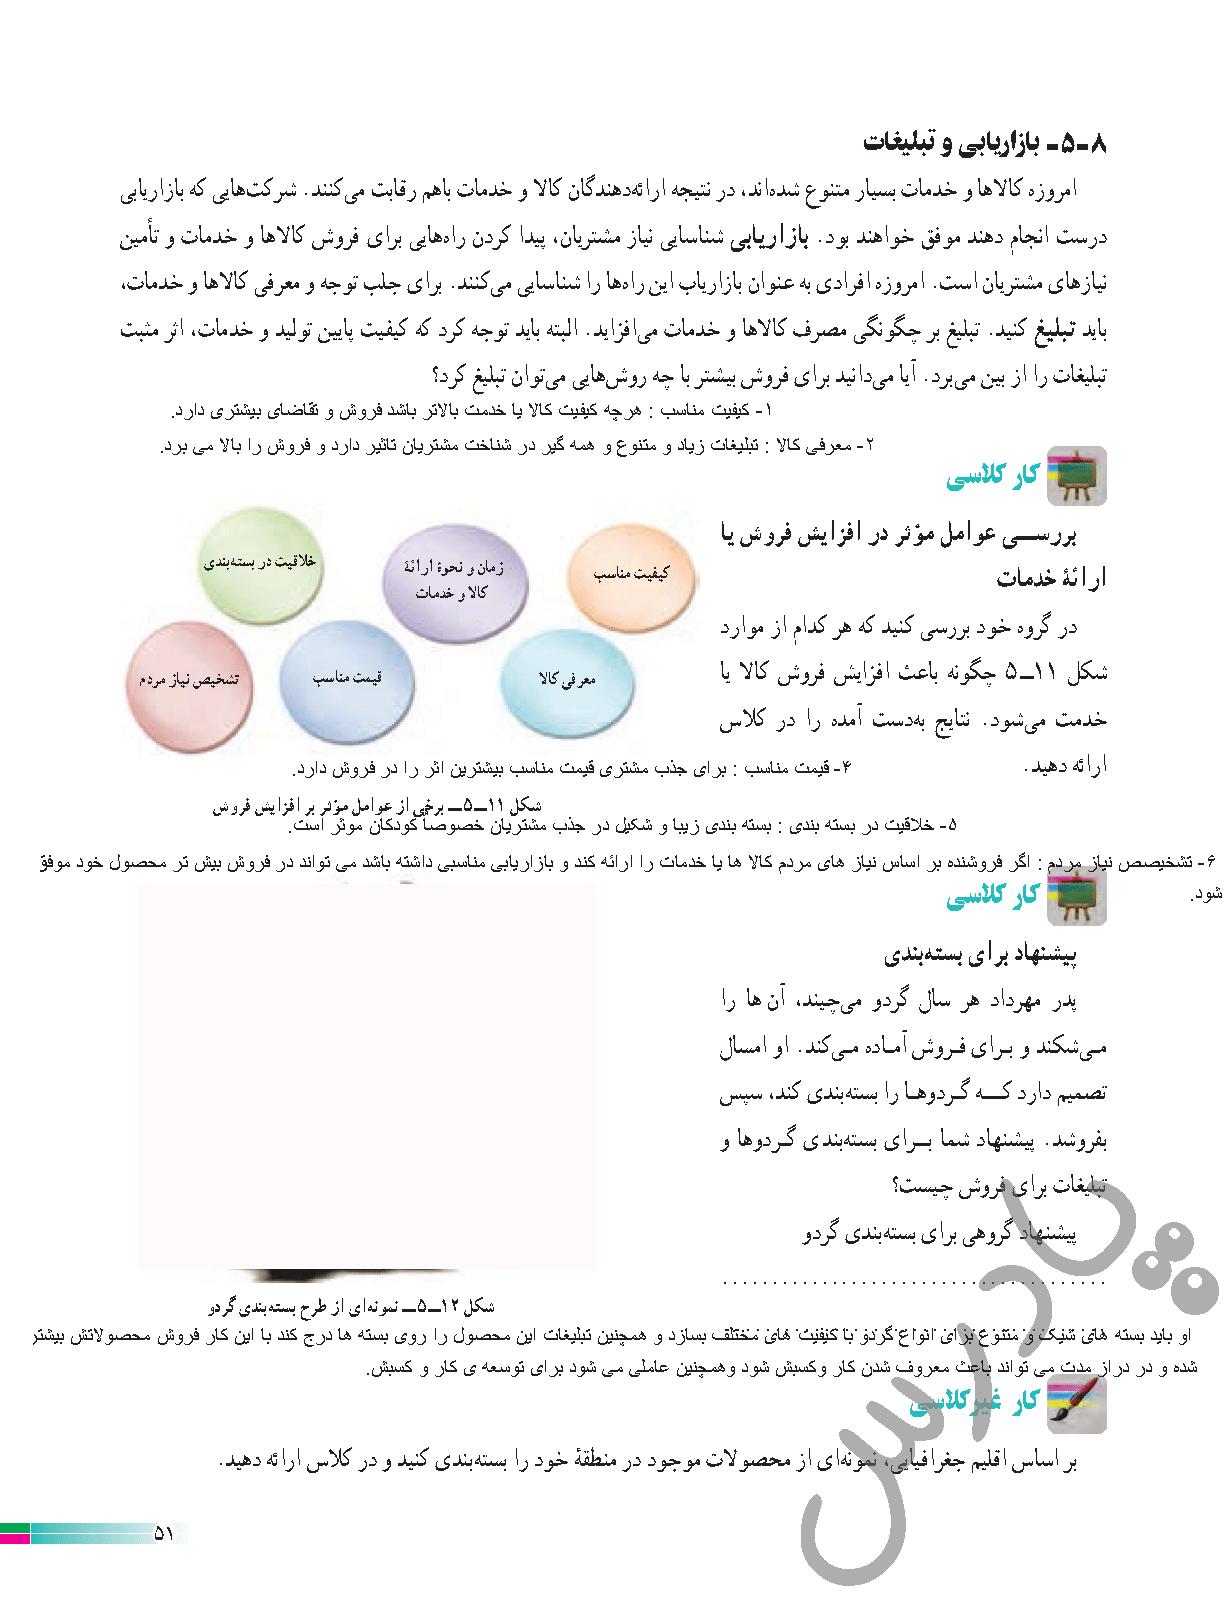 جواب کاردرکلاس صفحه 51 کاروفناوری هفتم